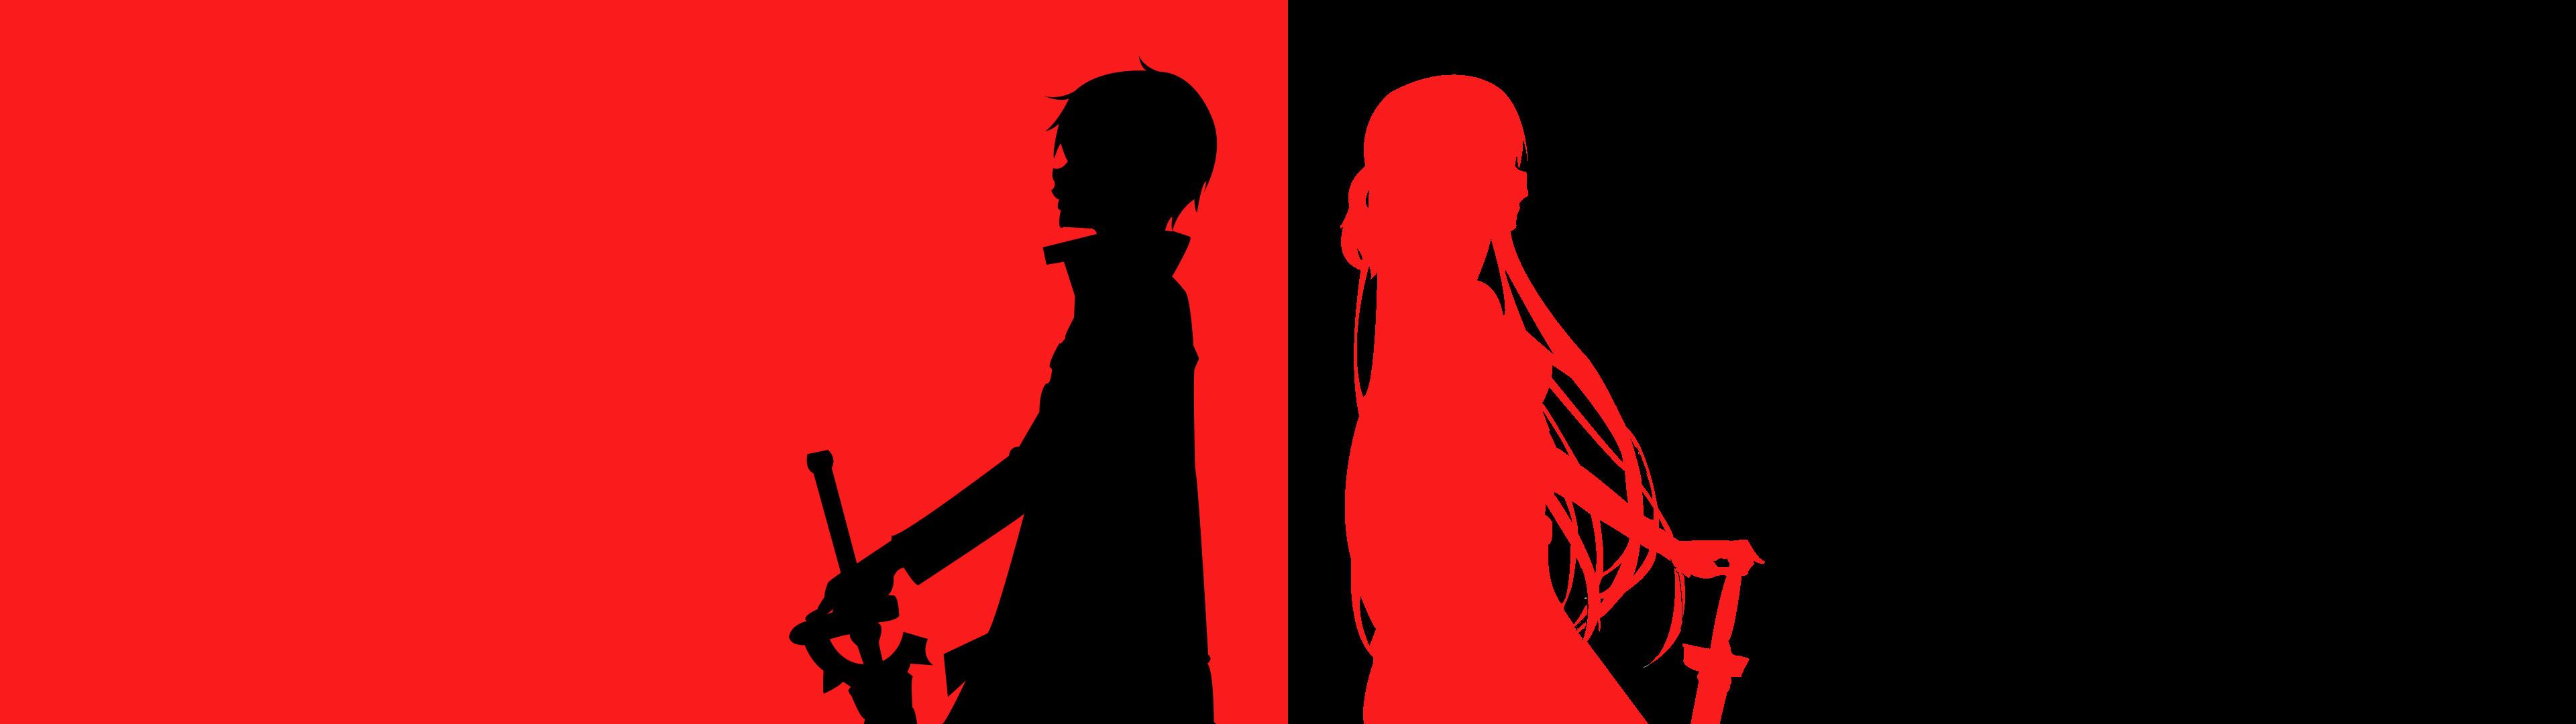 Sword Art Online Dual Monitor Wallpaper Anime Top Wallpaper